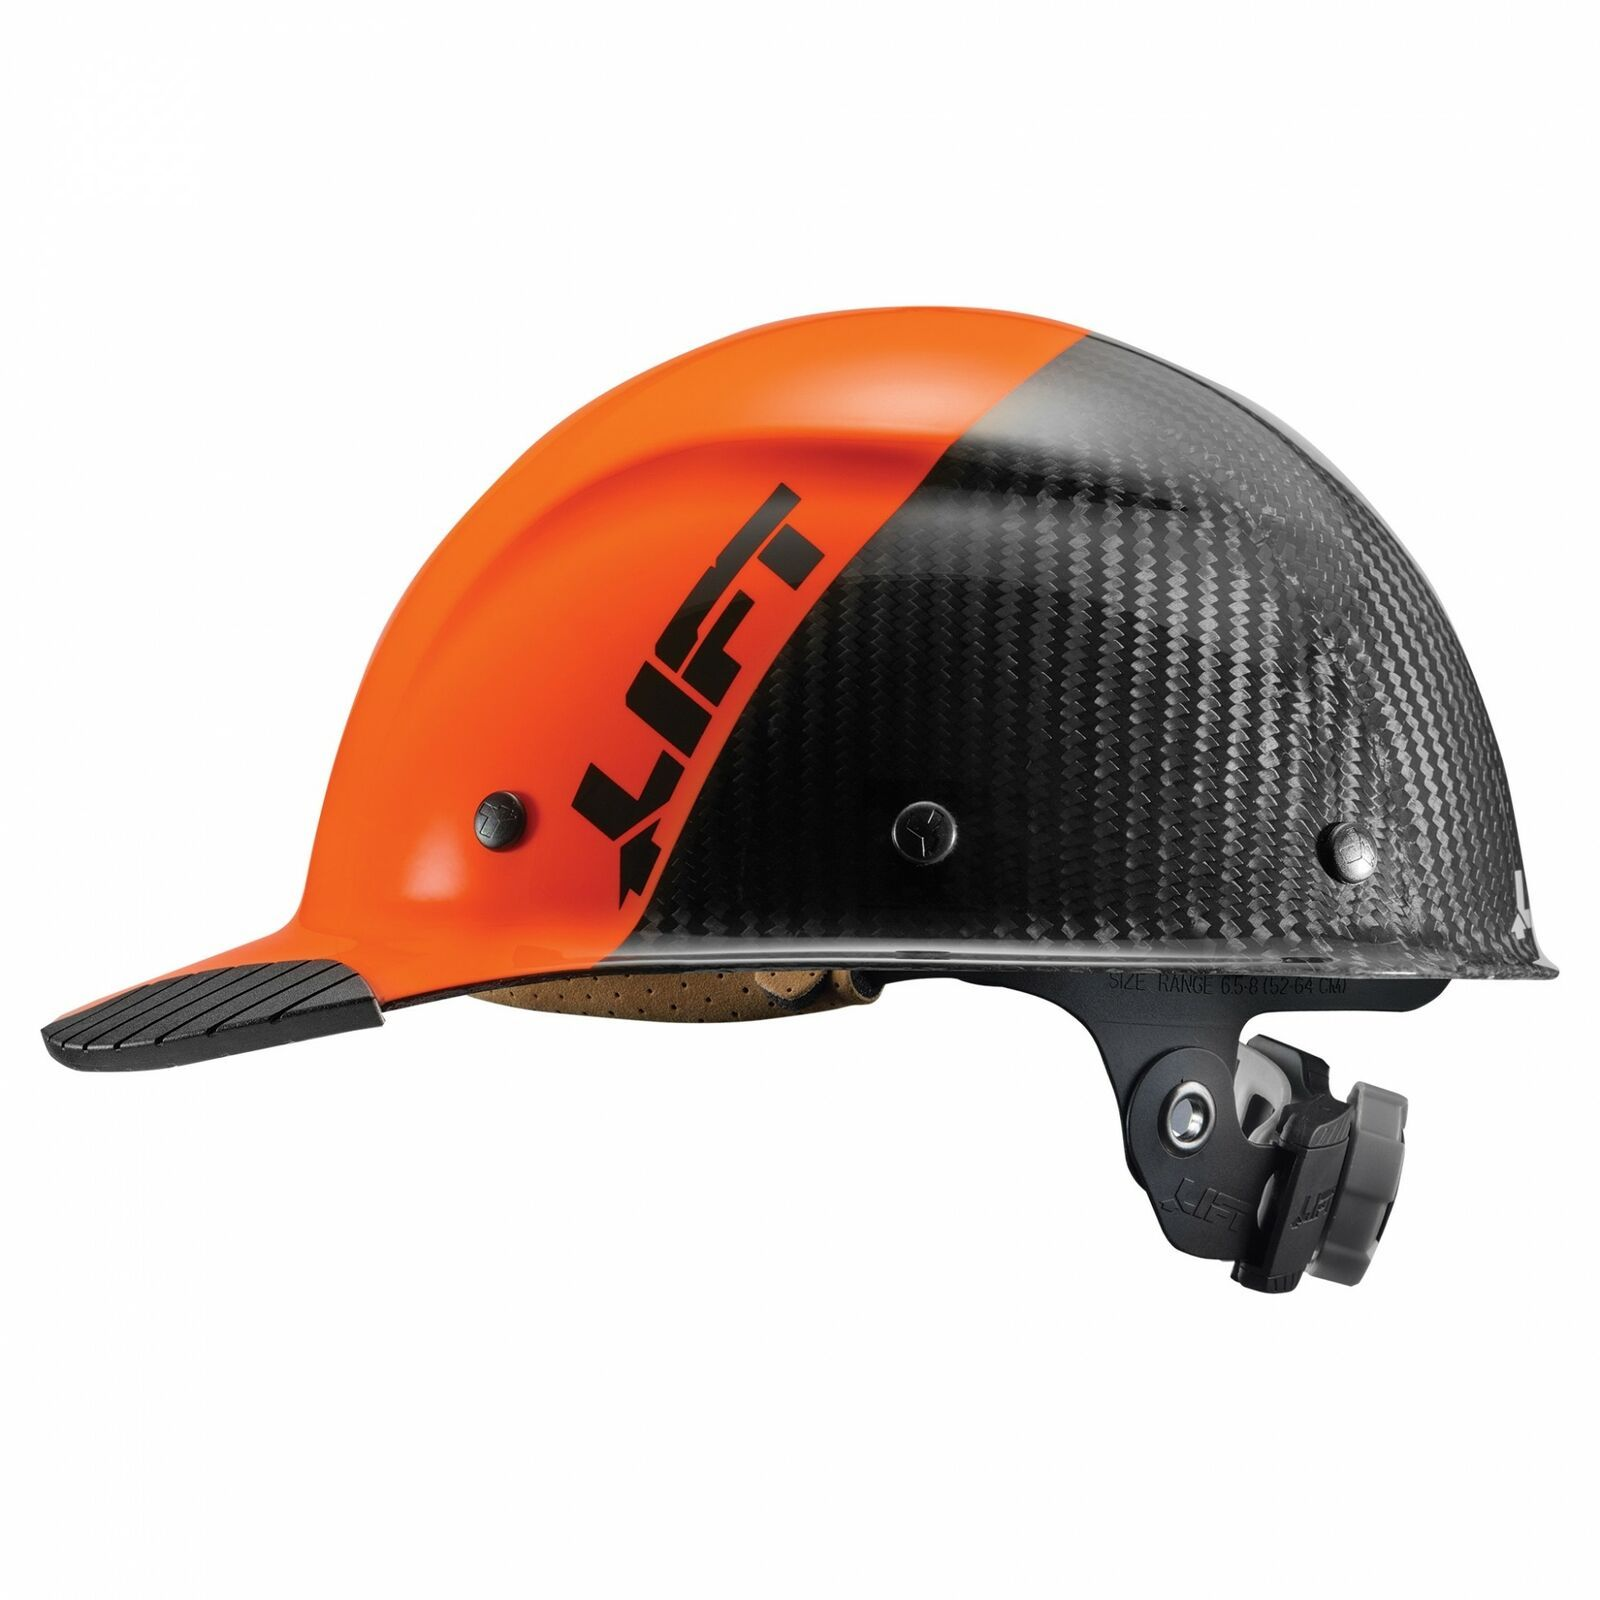 Lift Safety Dax Fifty 50 Hard Hat Carbon Fiber Cap Orange Black Hdc50c 19oc Walmart Com Carbon Fiber Hard Hats Orange Black